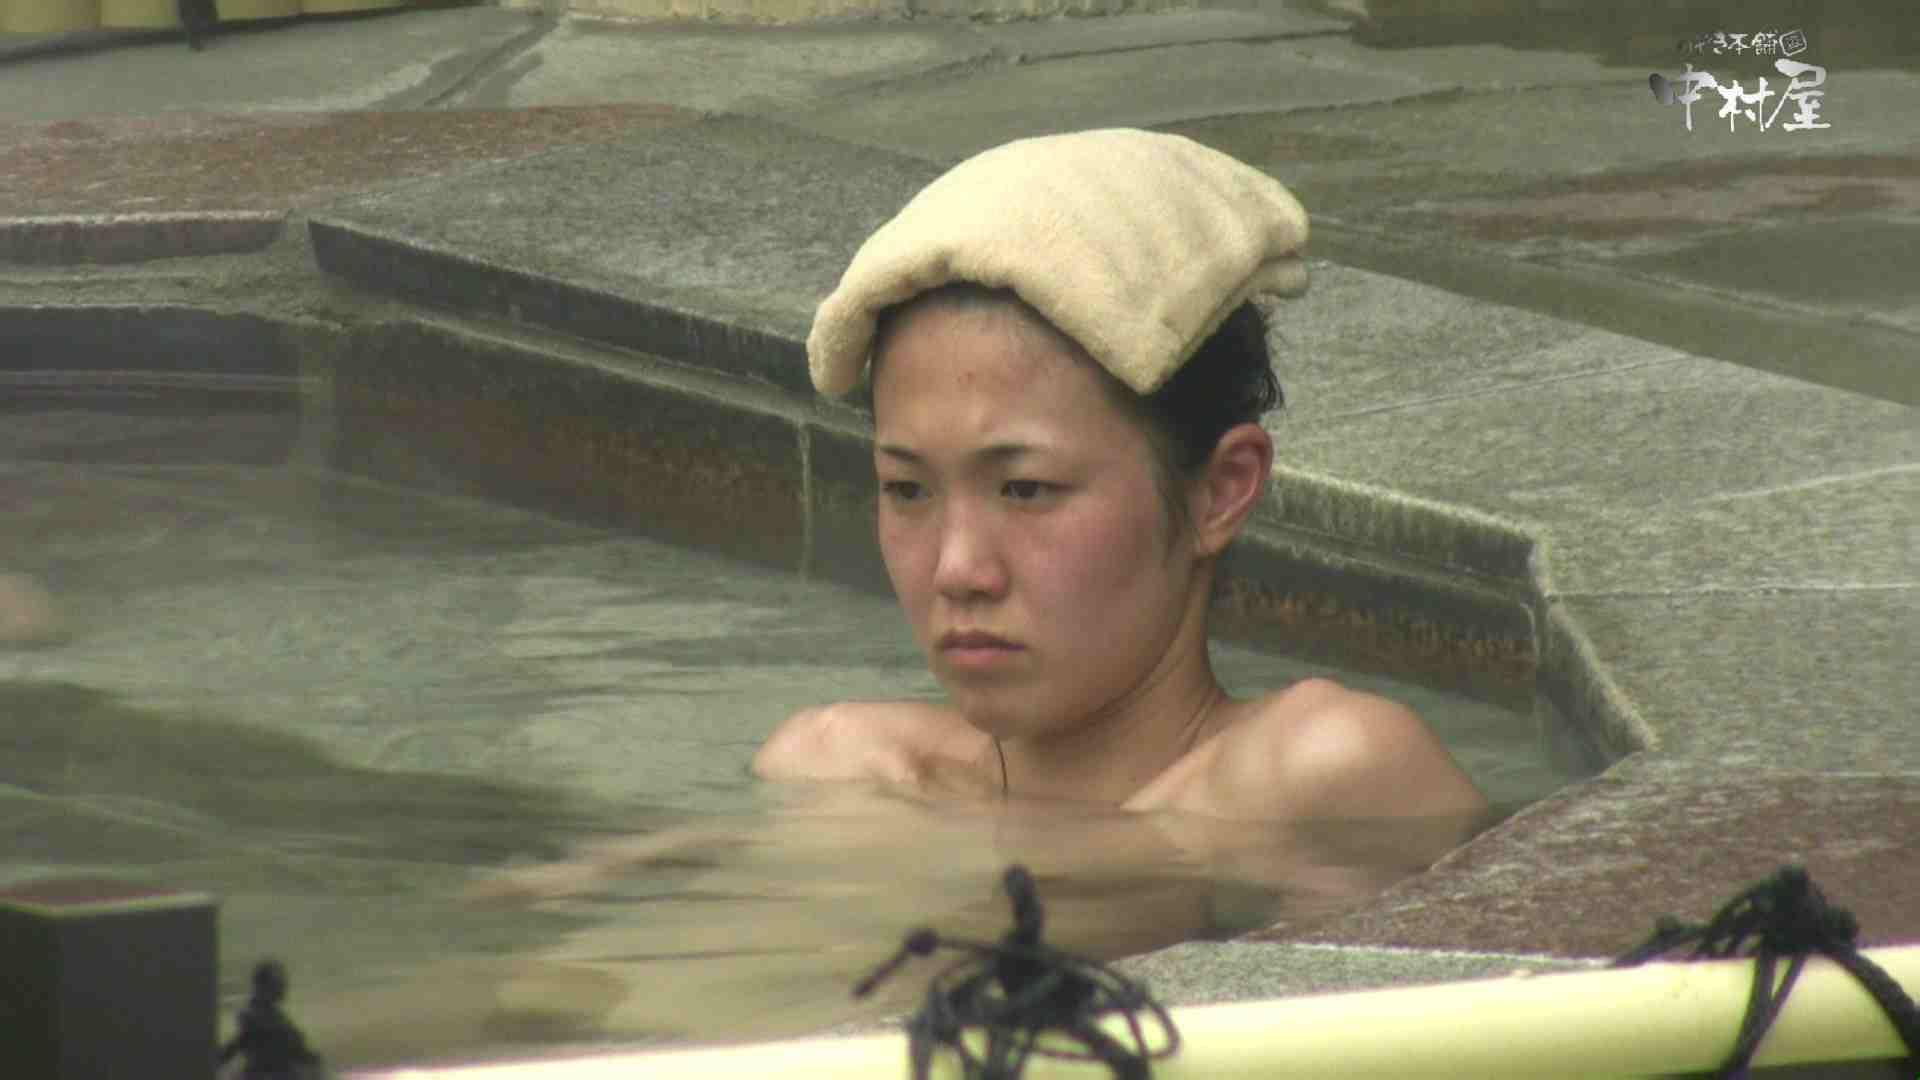 Aquaな露天風呂Vol.889 0   0  87連発 77